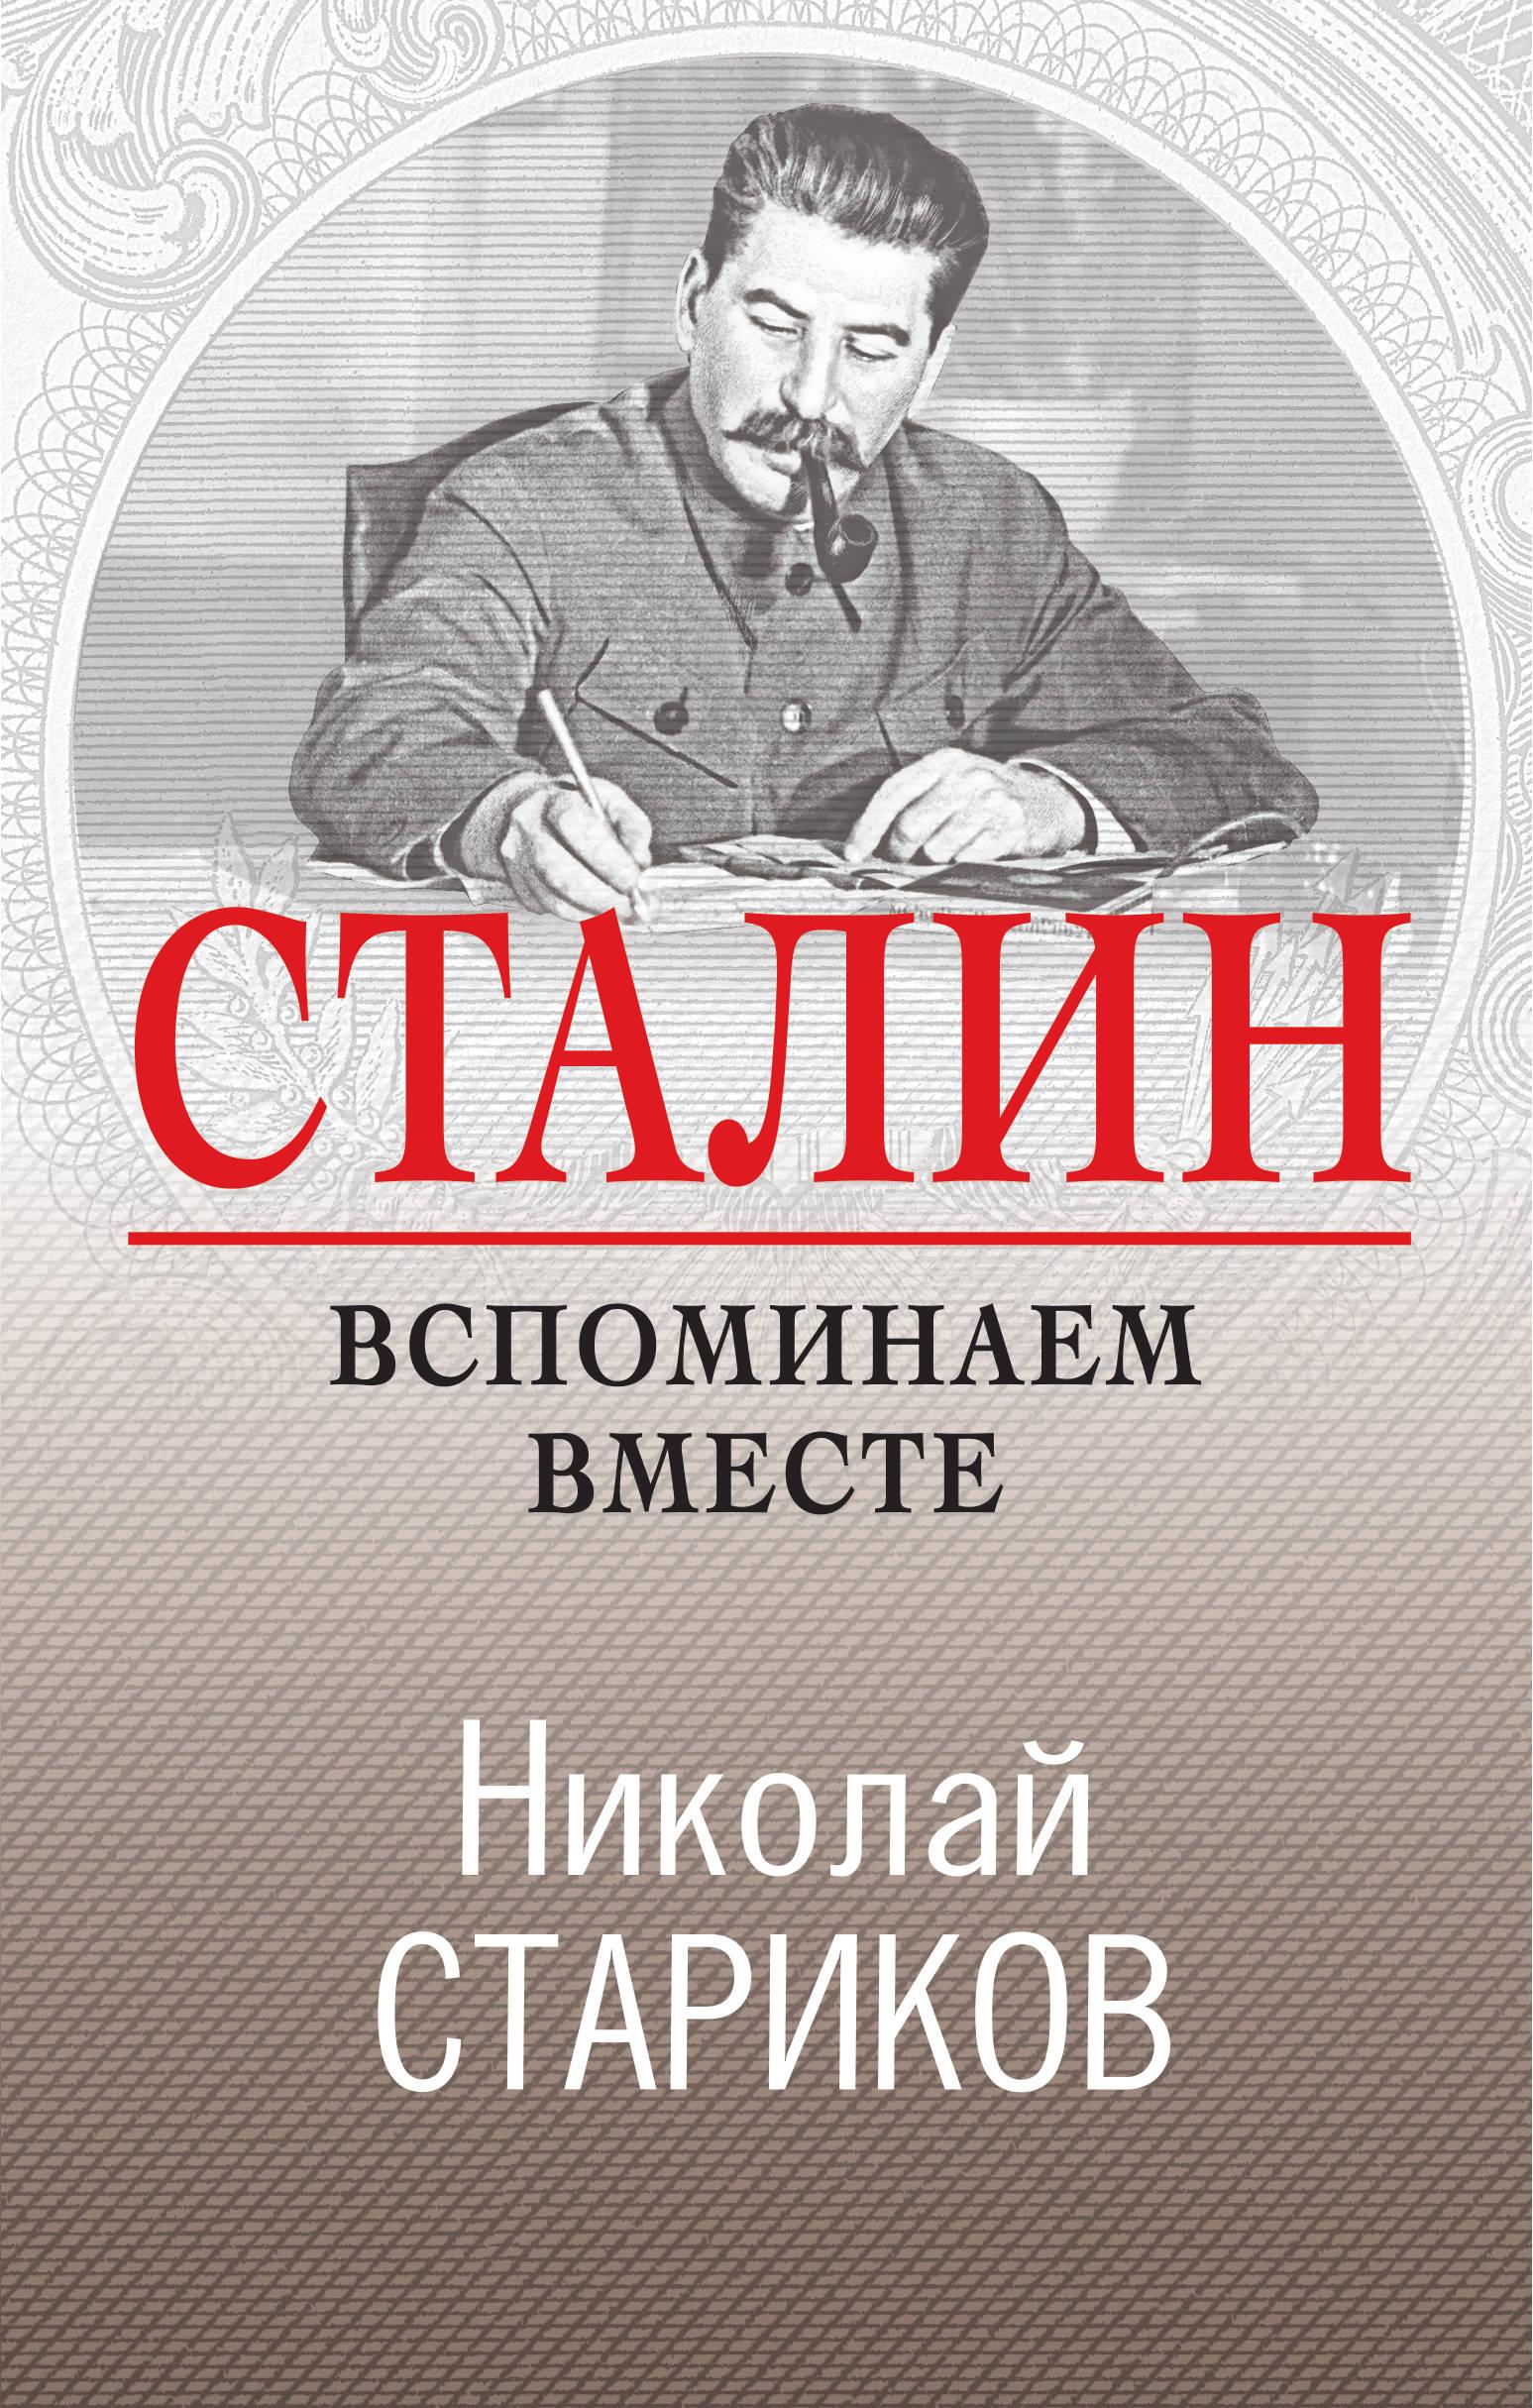 сталинский период